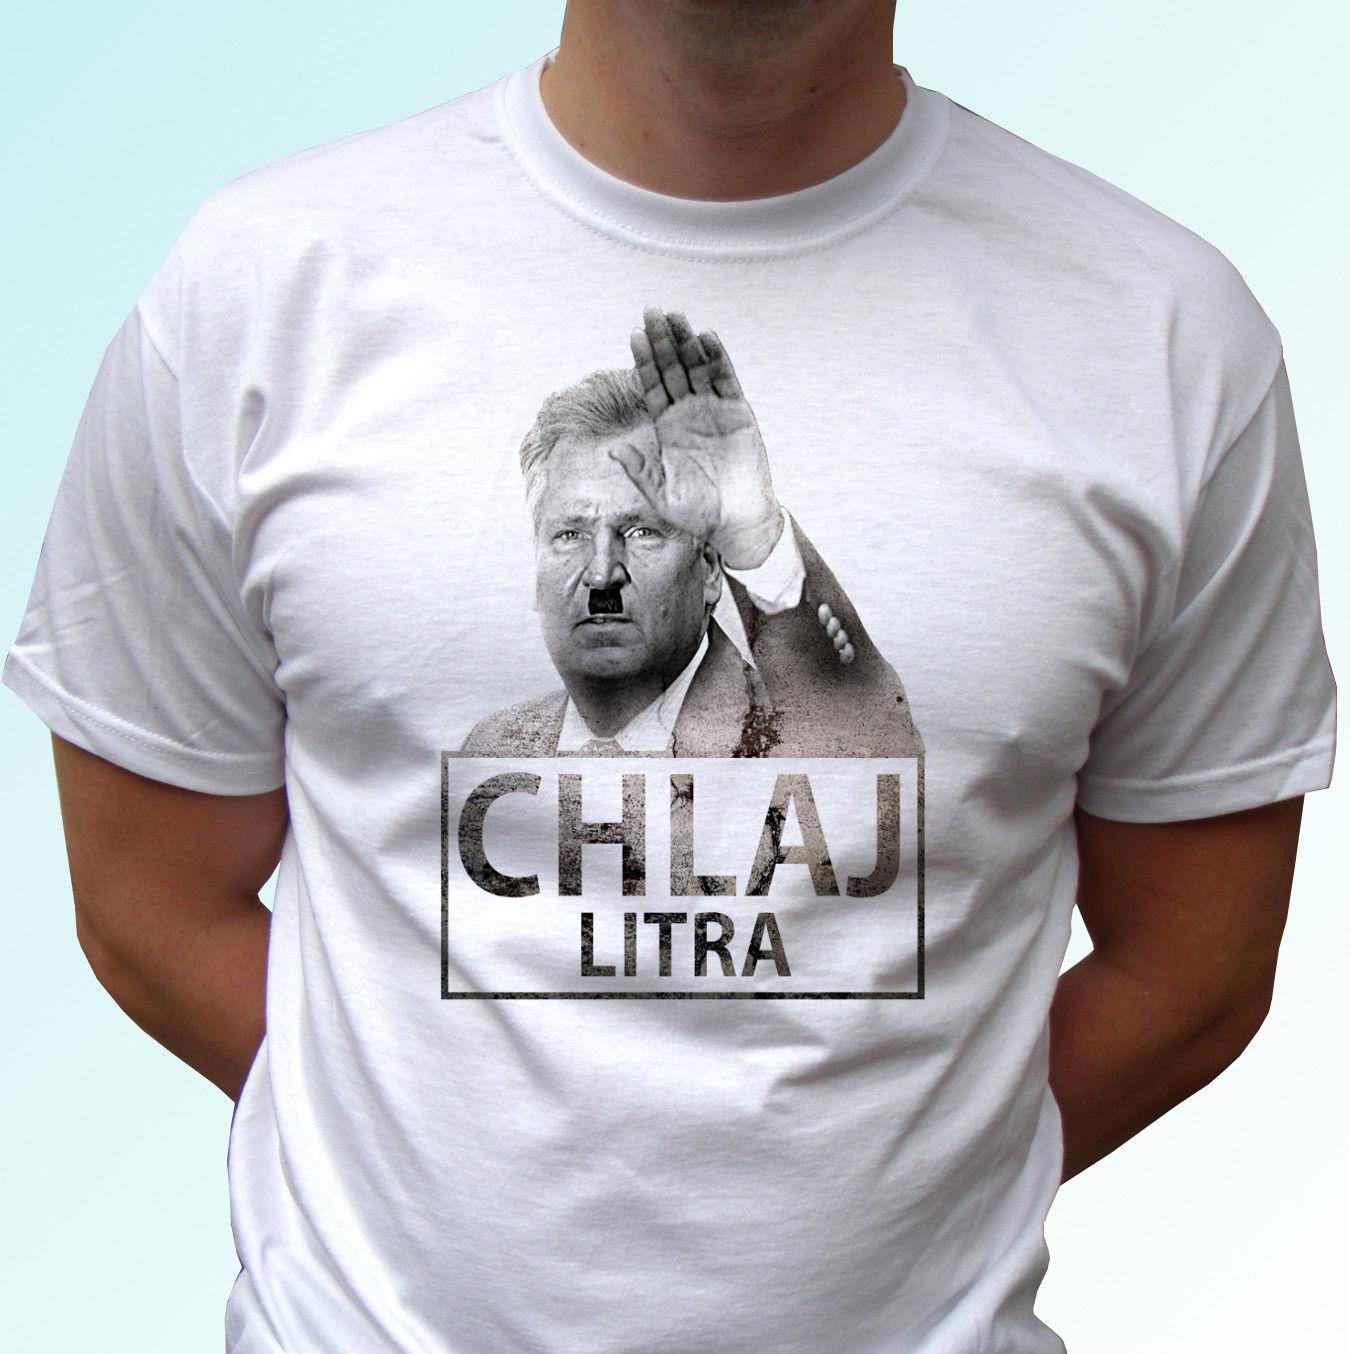 Chlaj Lit funny   shirt   Poland alcohol   t     shirt   funny   shirts   Polish Tops streetwear pride   t     shirt   men Cool Casual Free Shipping